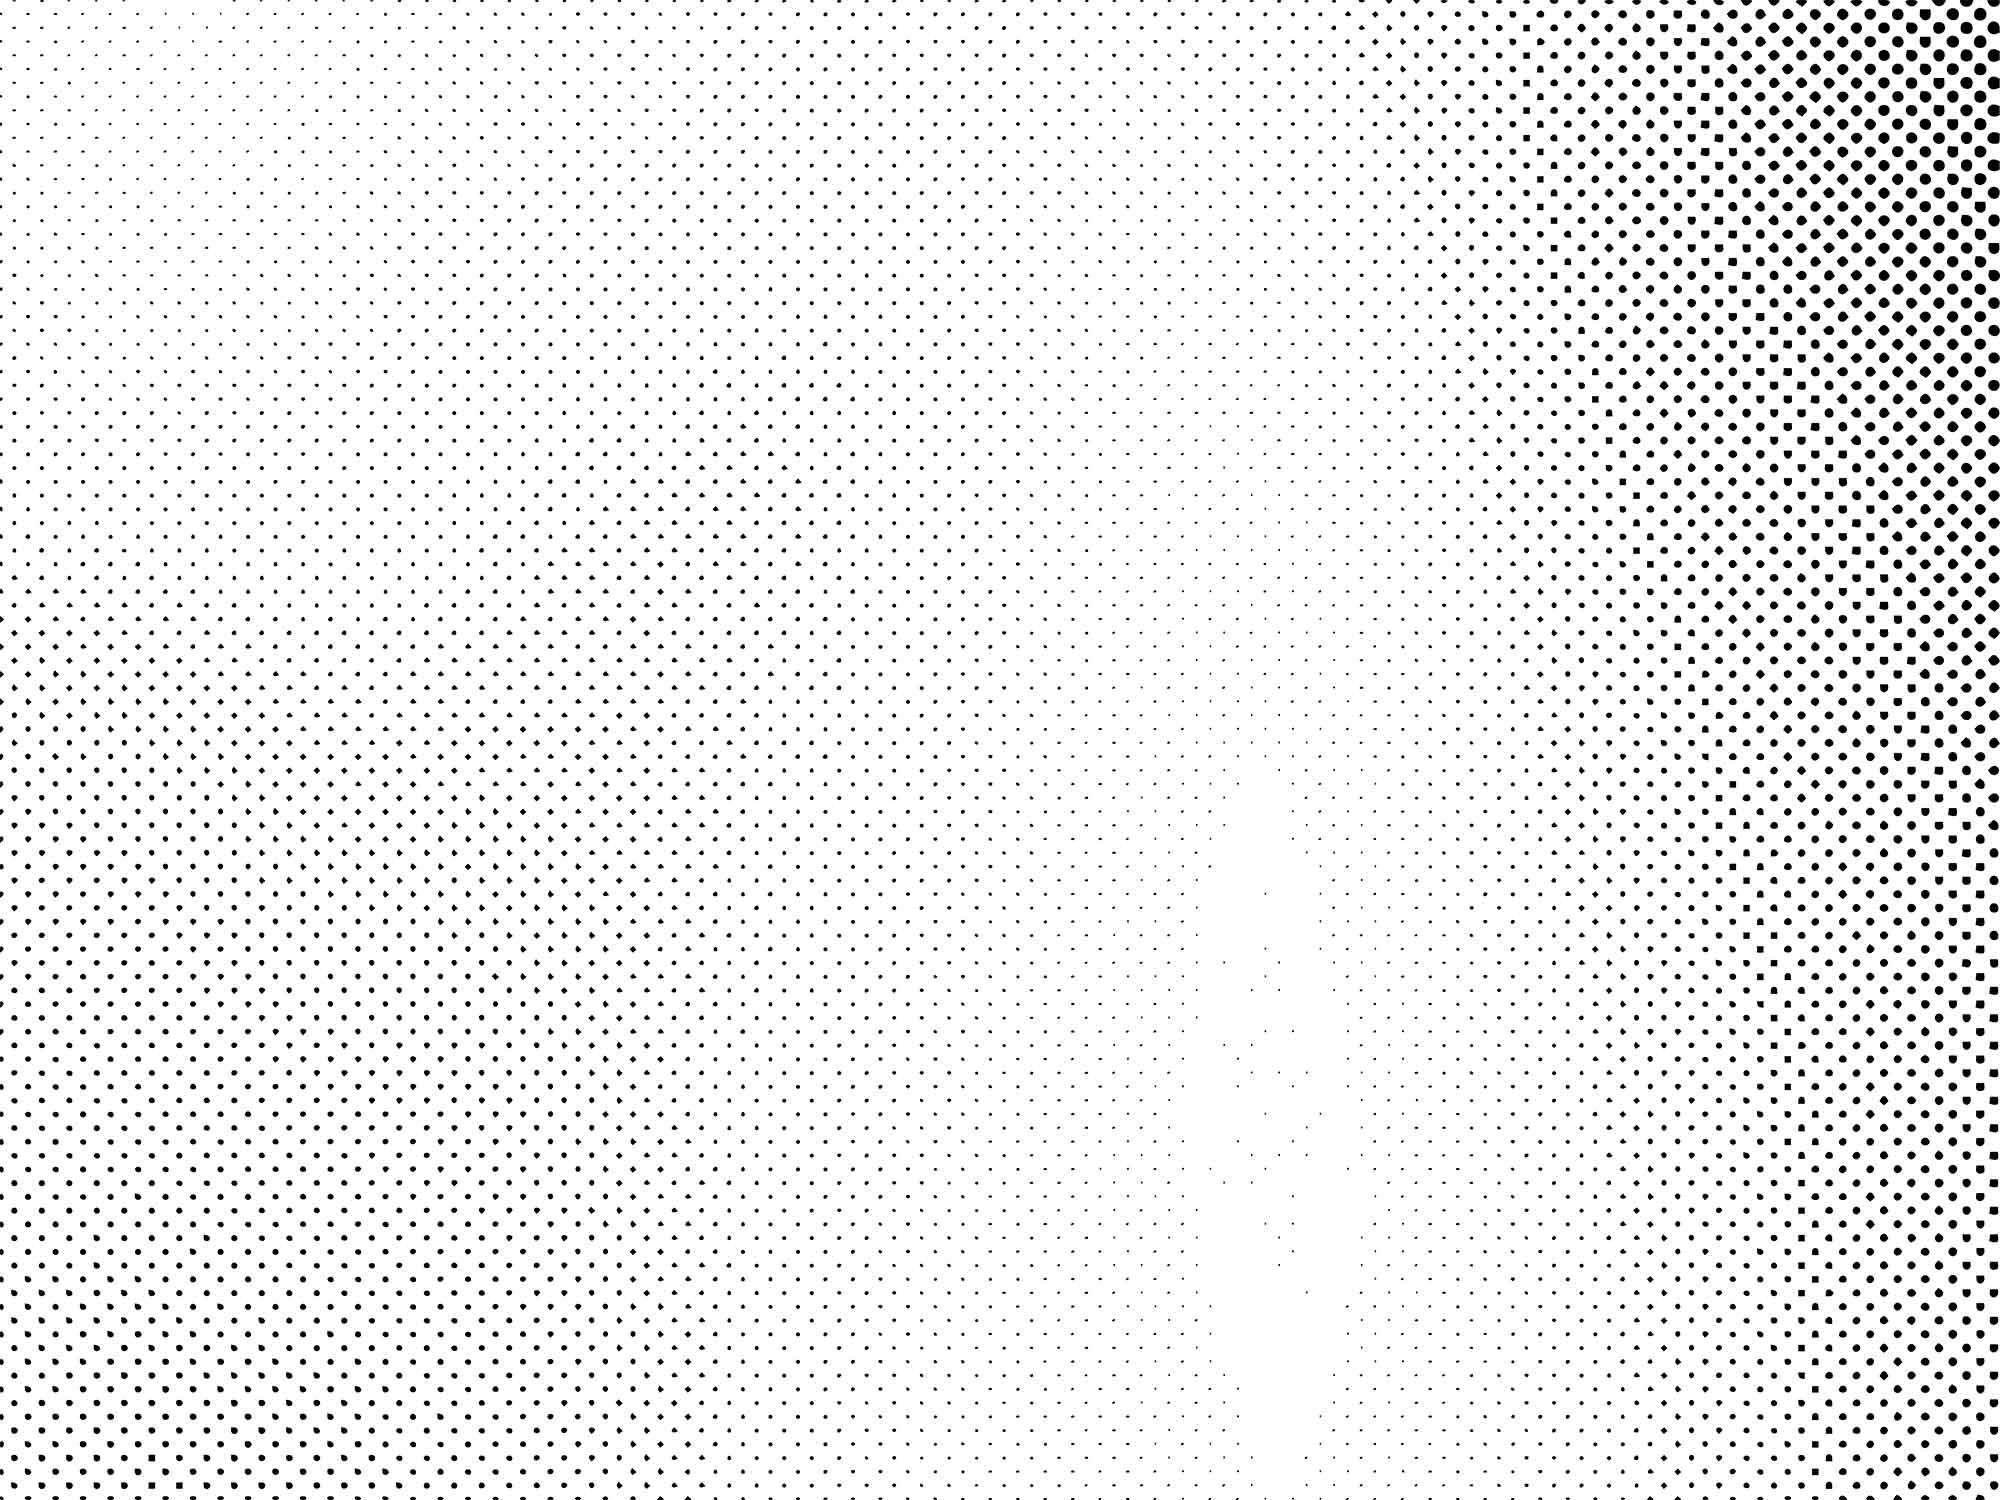 Halftone Dot Textures 10